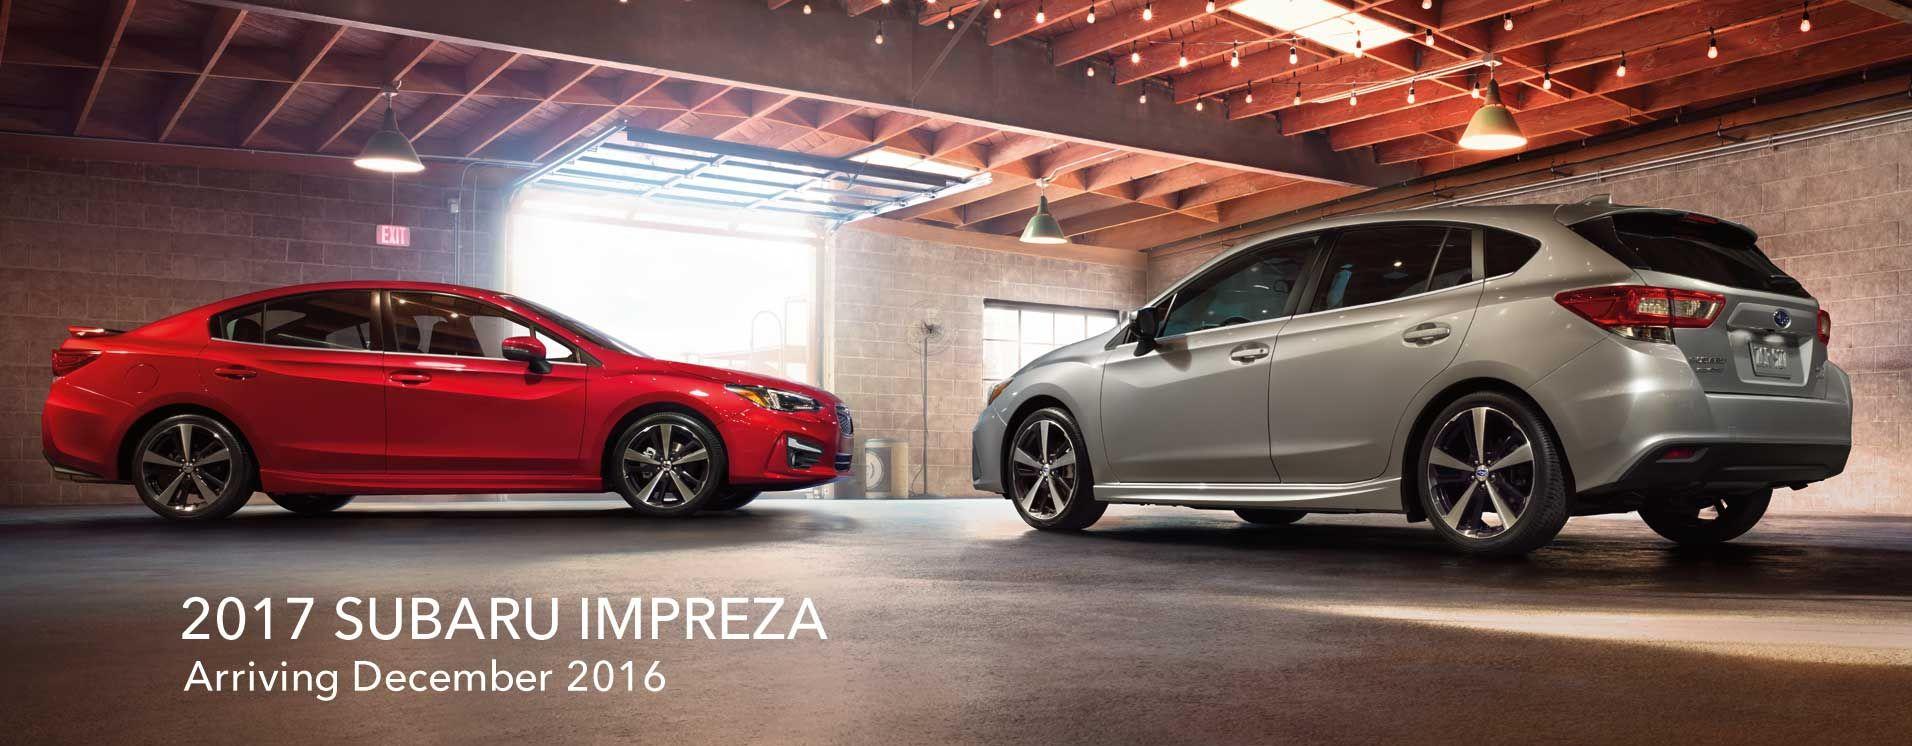 Subaru impreza 2017 hatch